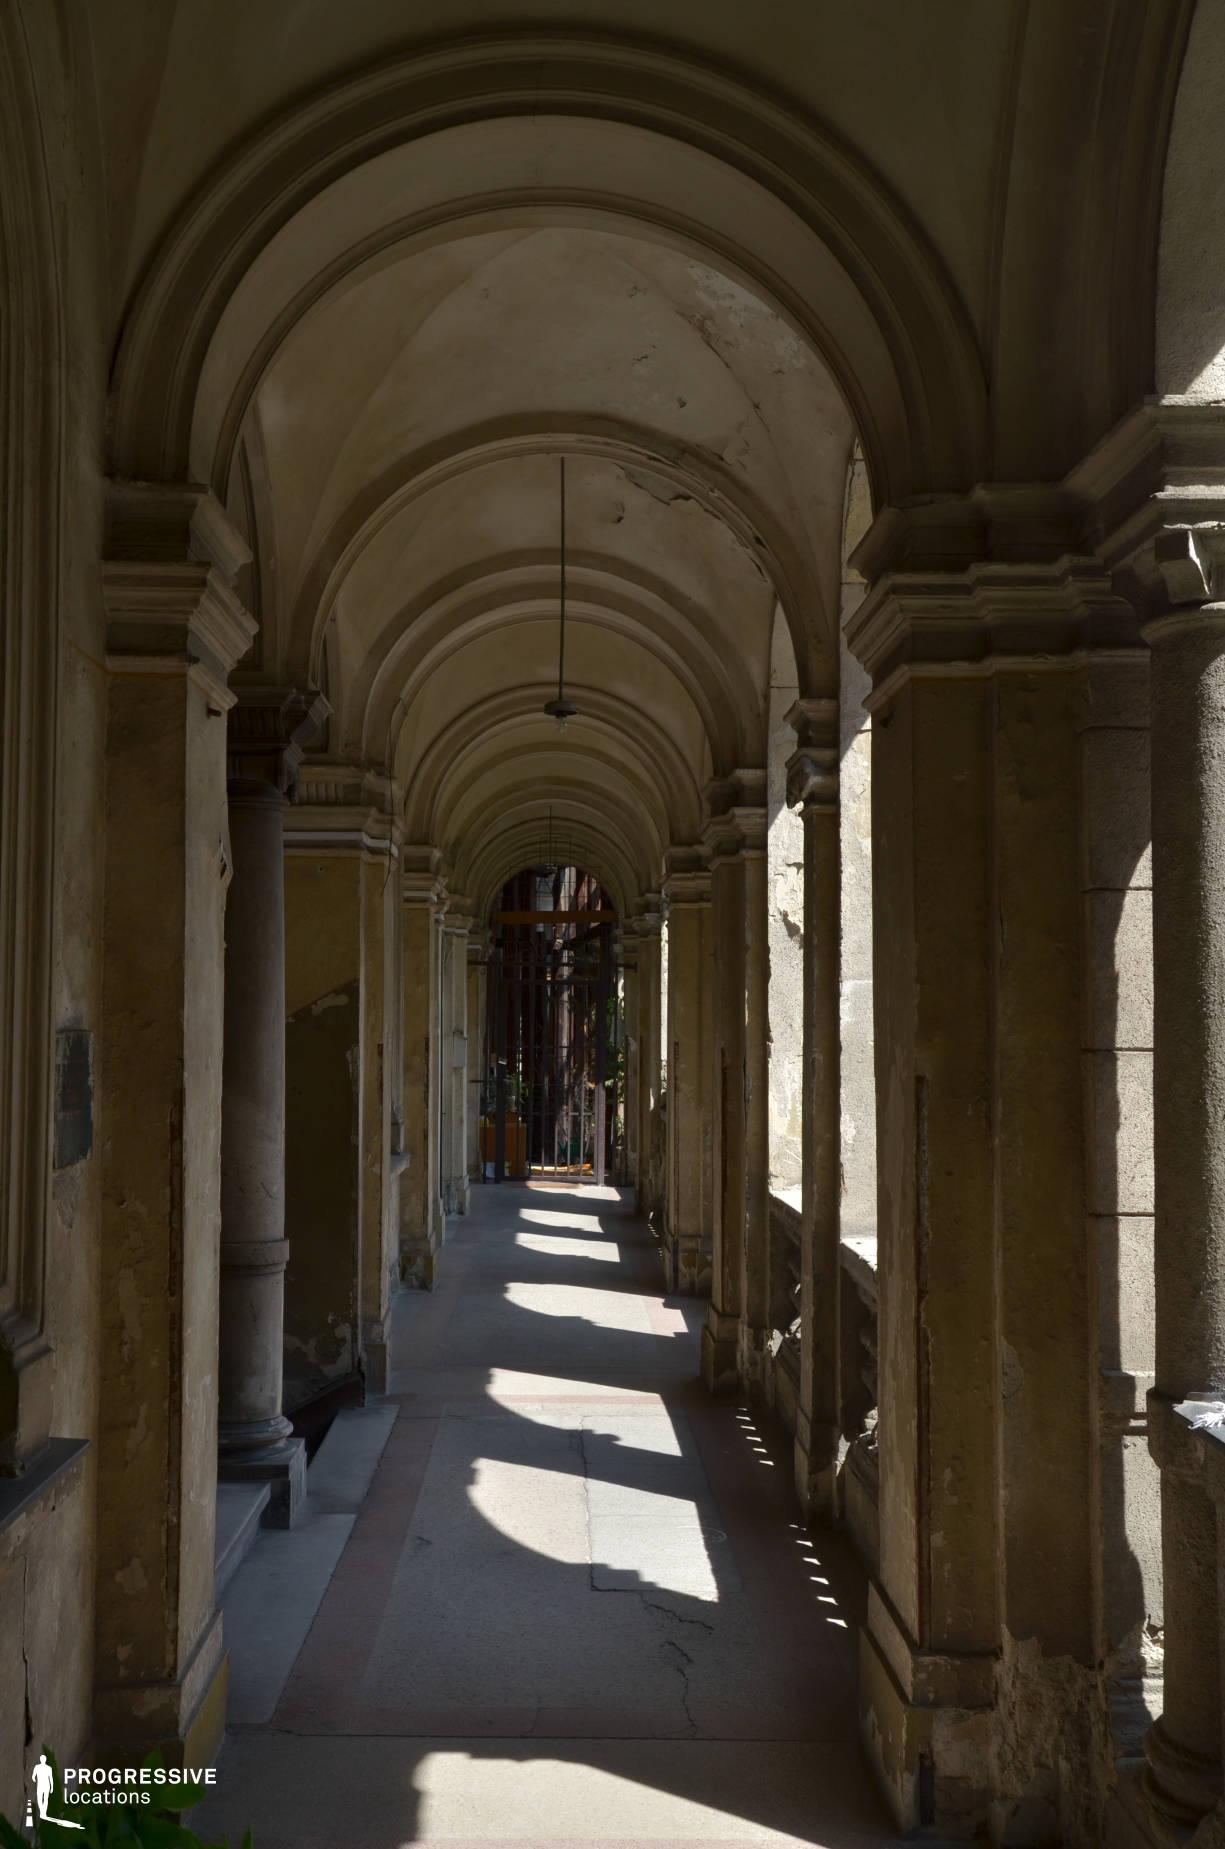 Locations in Budapest: Andrassy Street Arcade